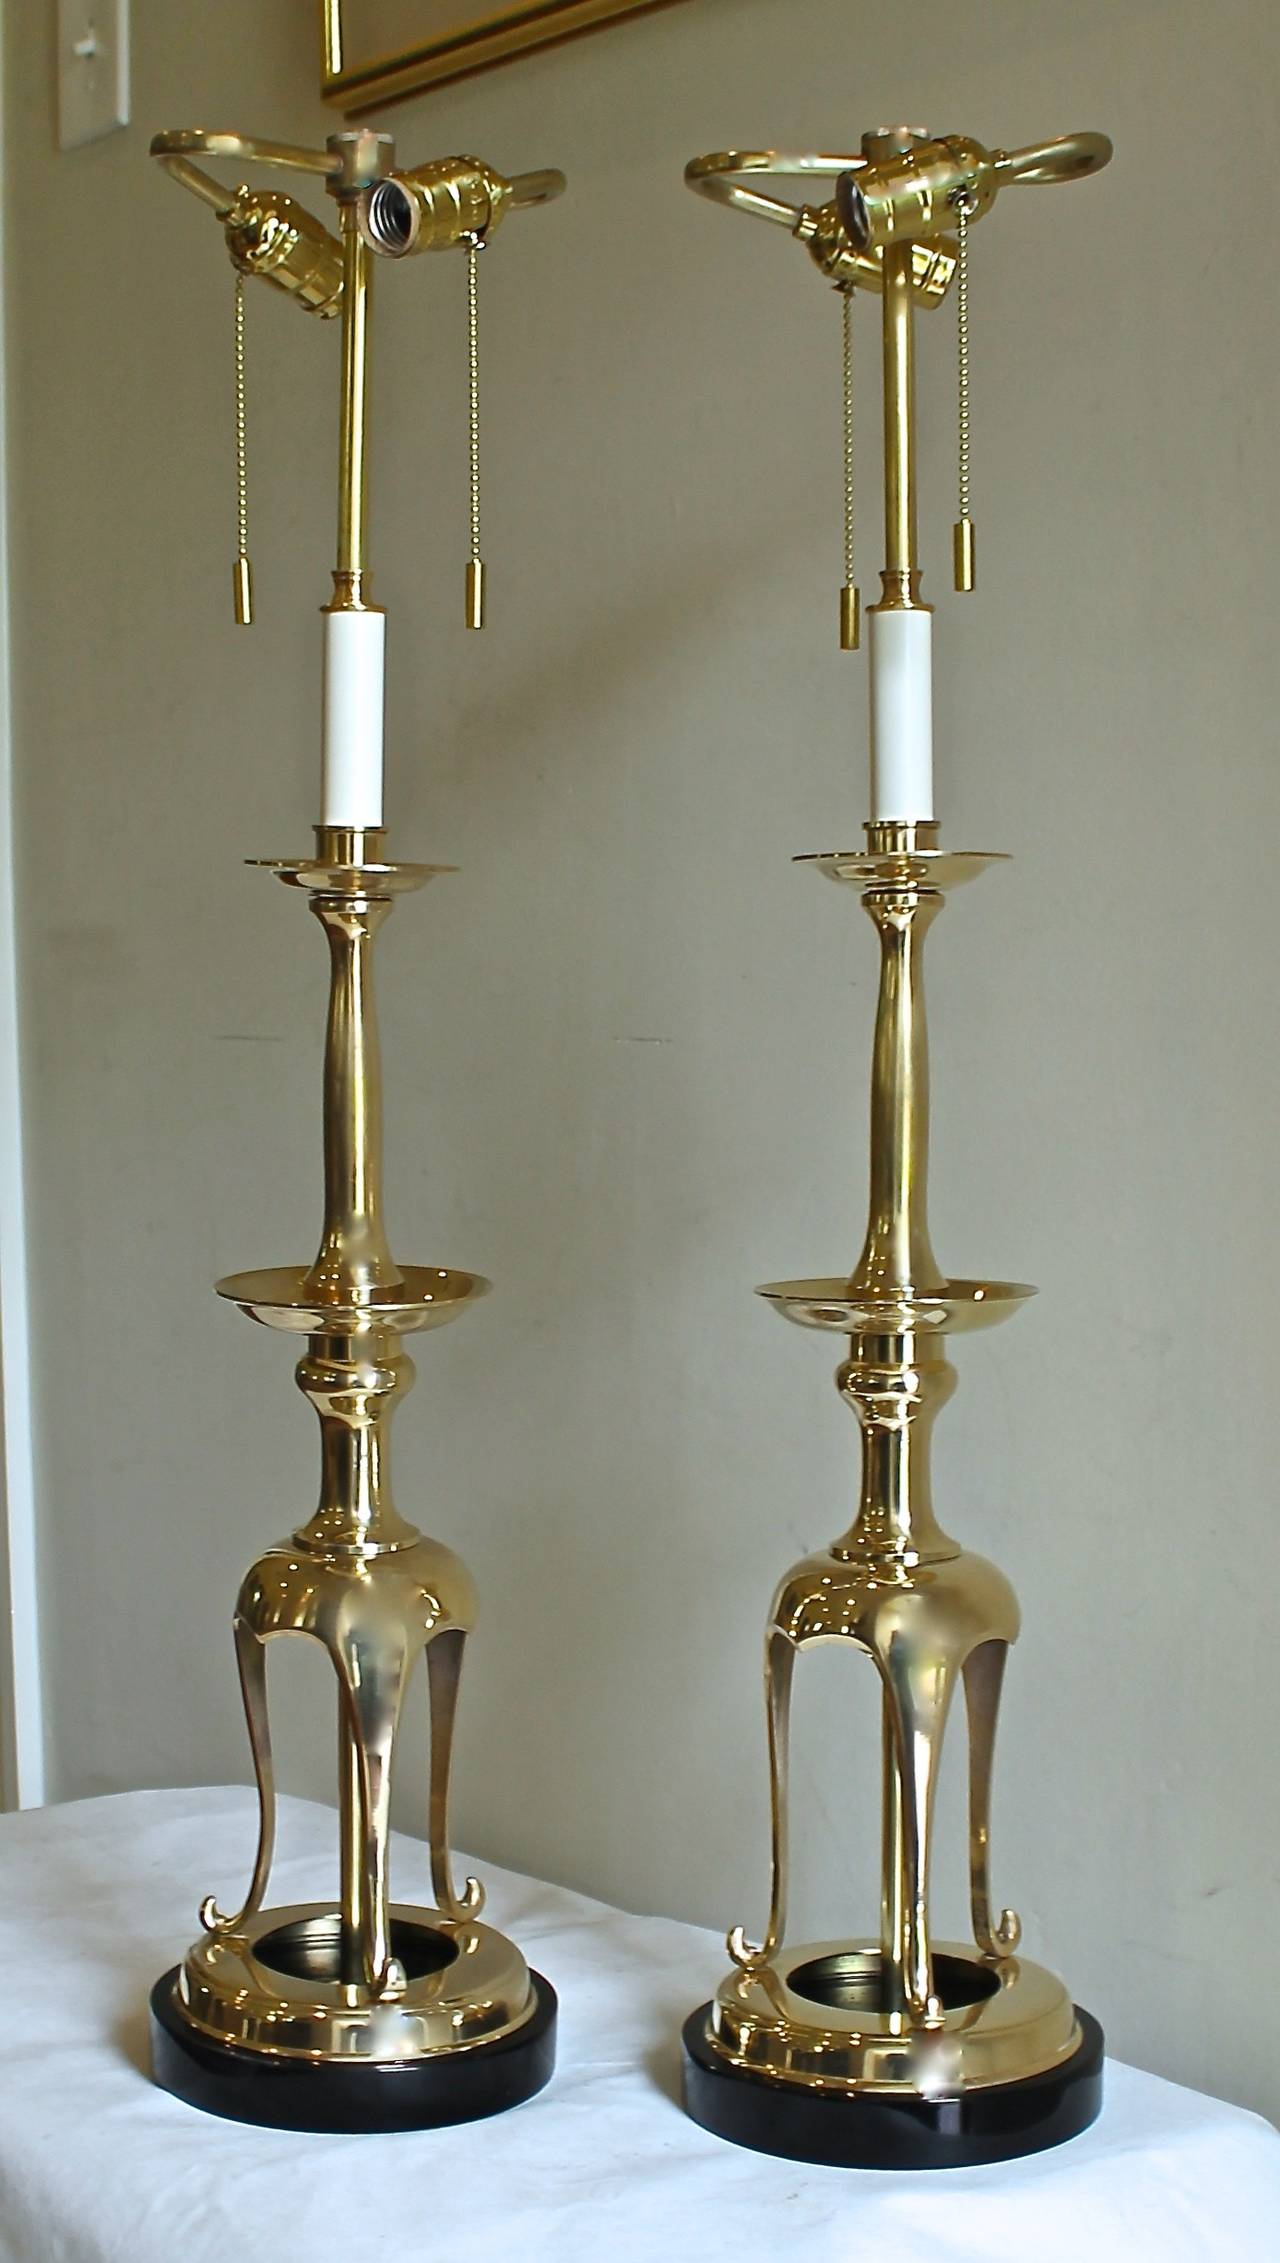 12 japanese candlesticks